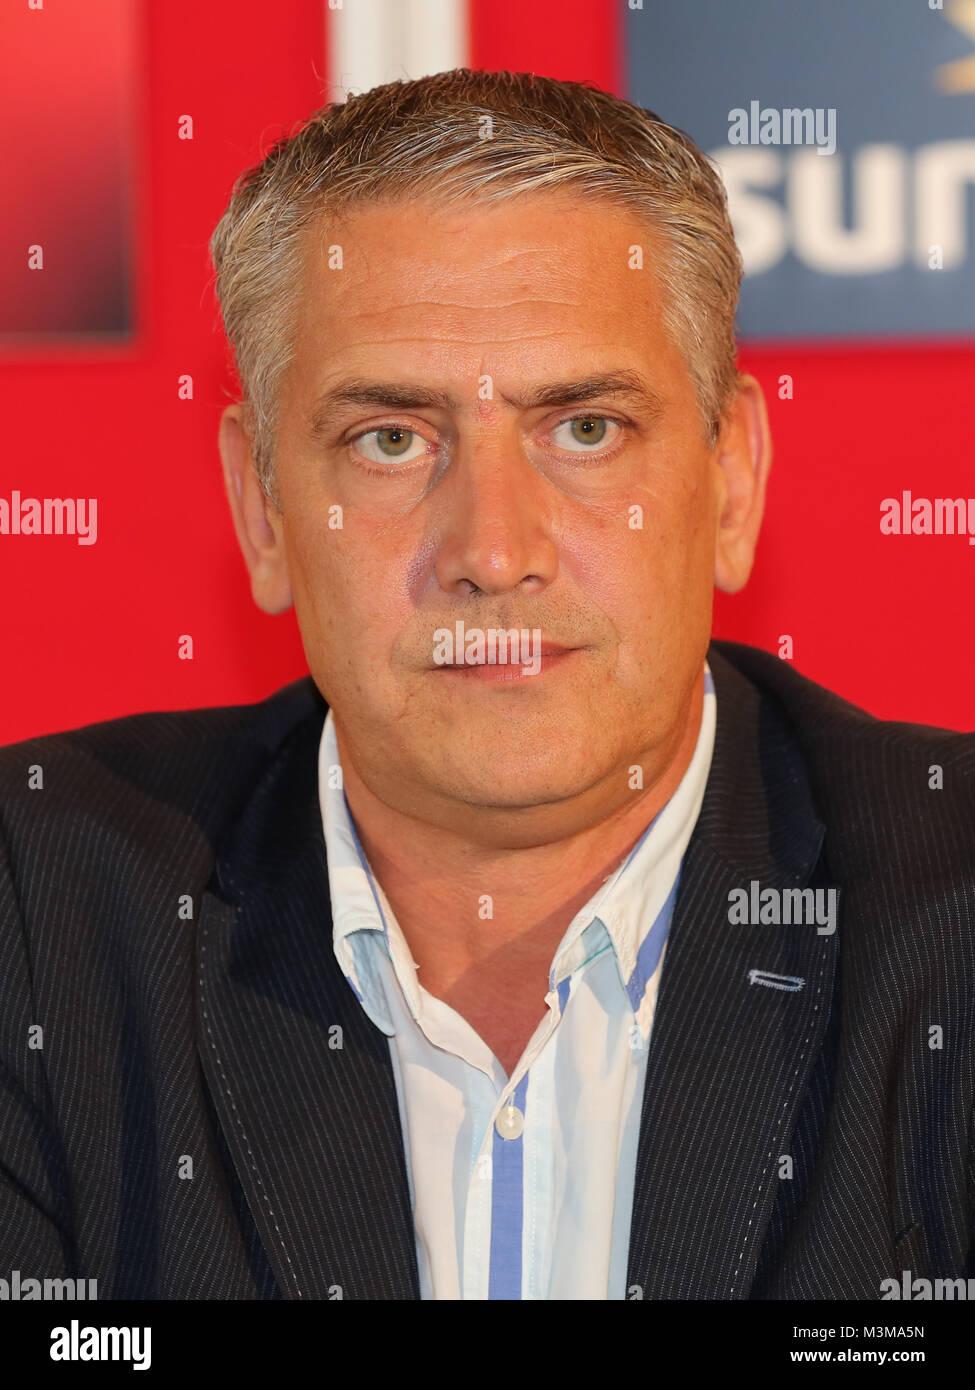 Box-Promoter Ulf Steinforth (SES Boxing) während der Pressekonferenz zum Europameisterschaftskampf am 12.11.2016 - Stock Image